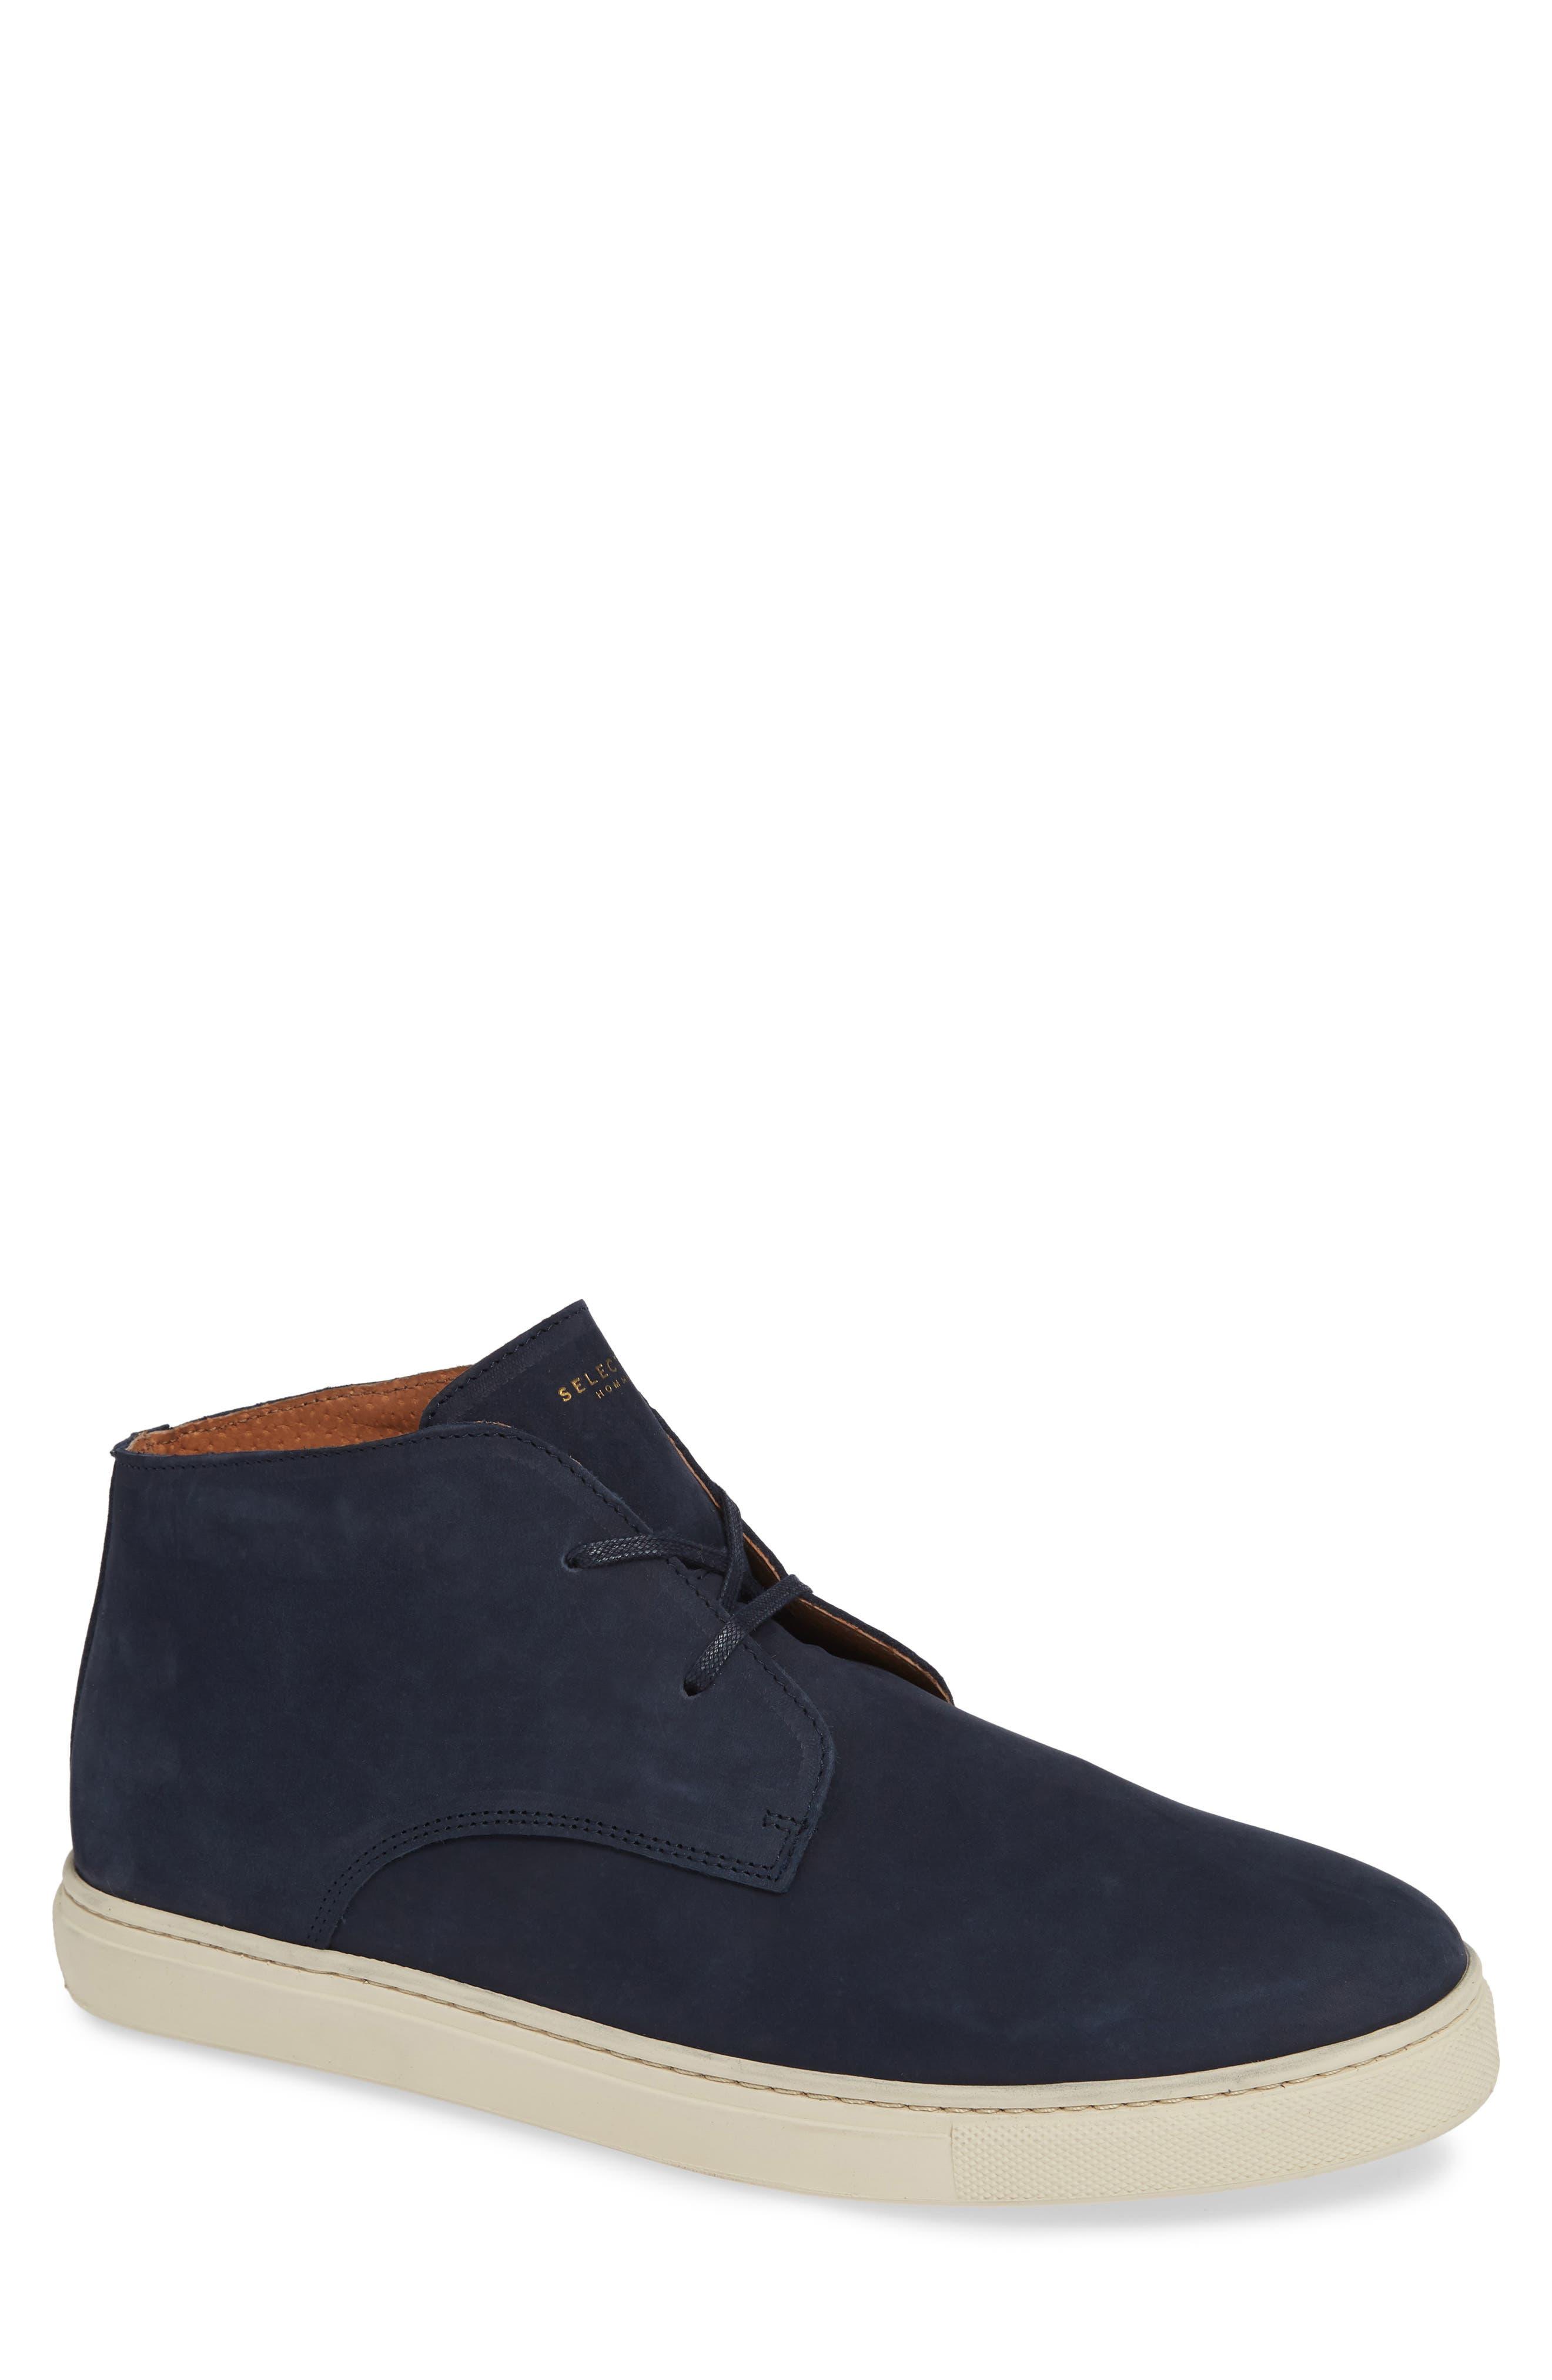 Dempsey Chukka Sneaker,                             Main thumbnail 1, color,                             DARK NAVY